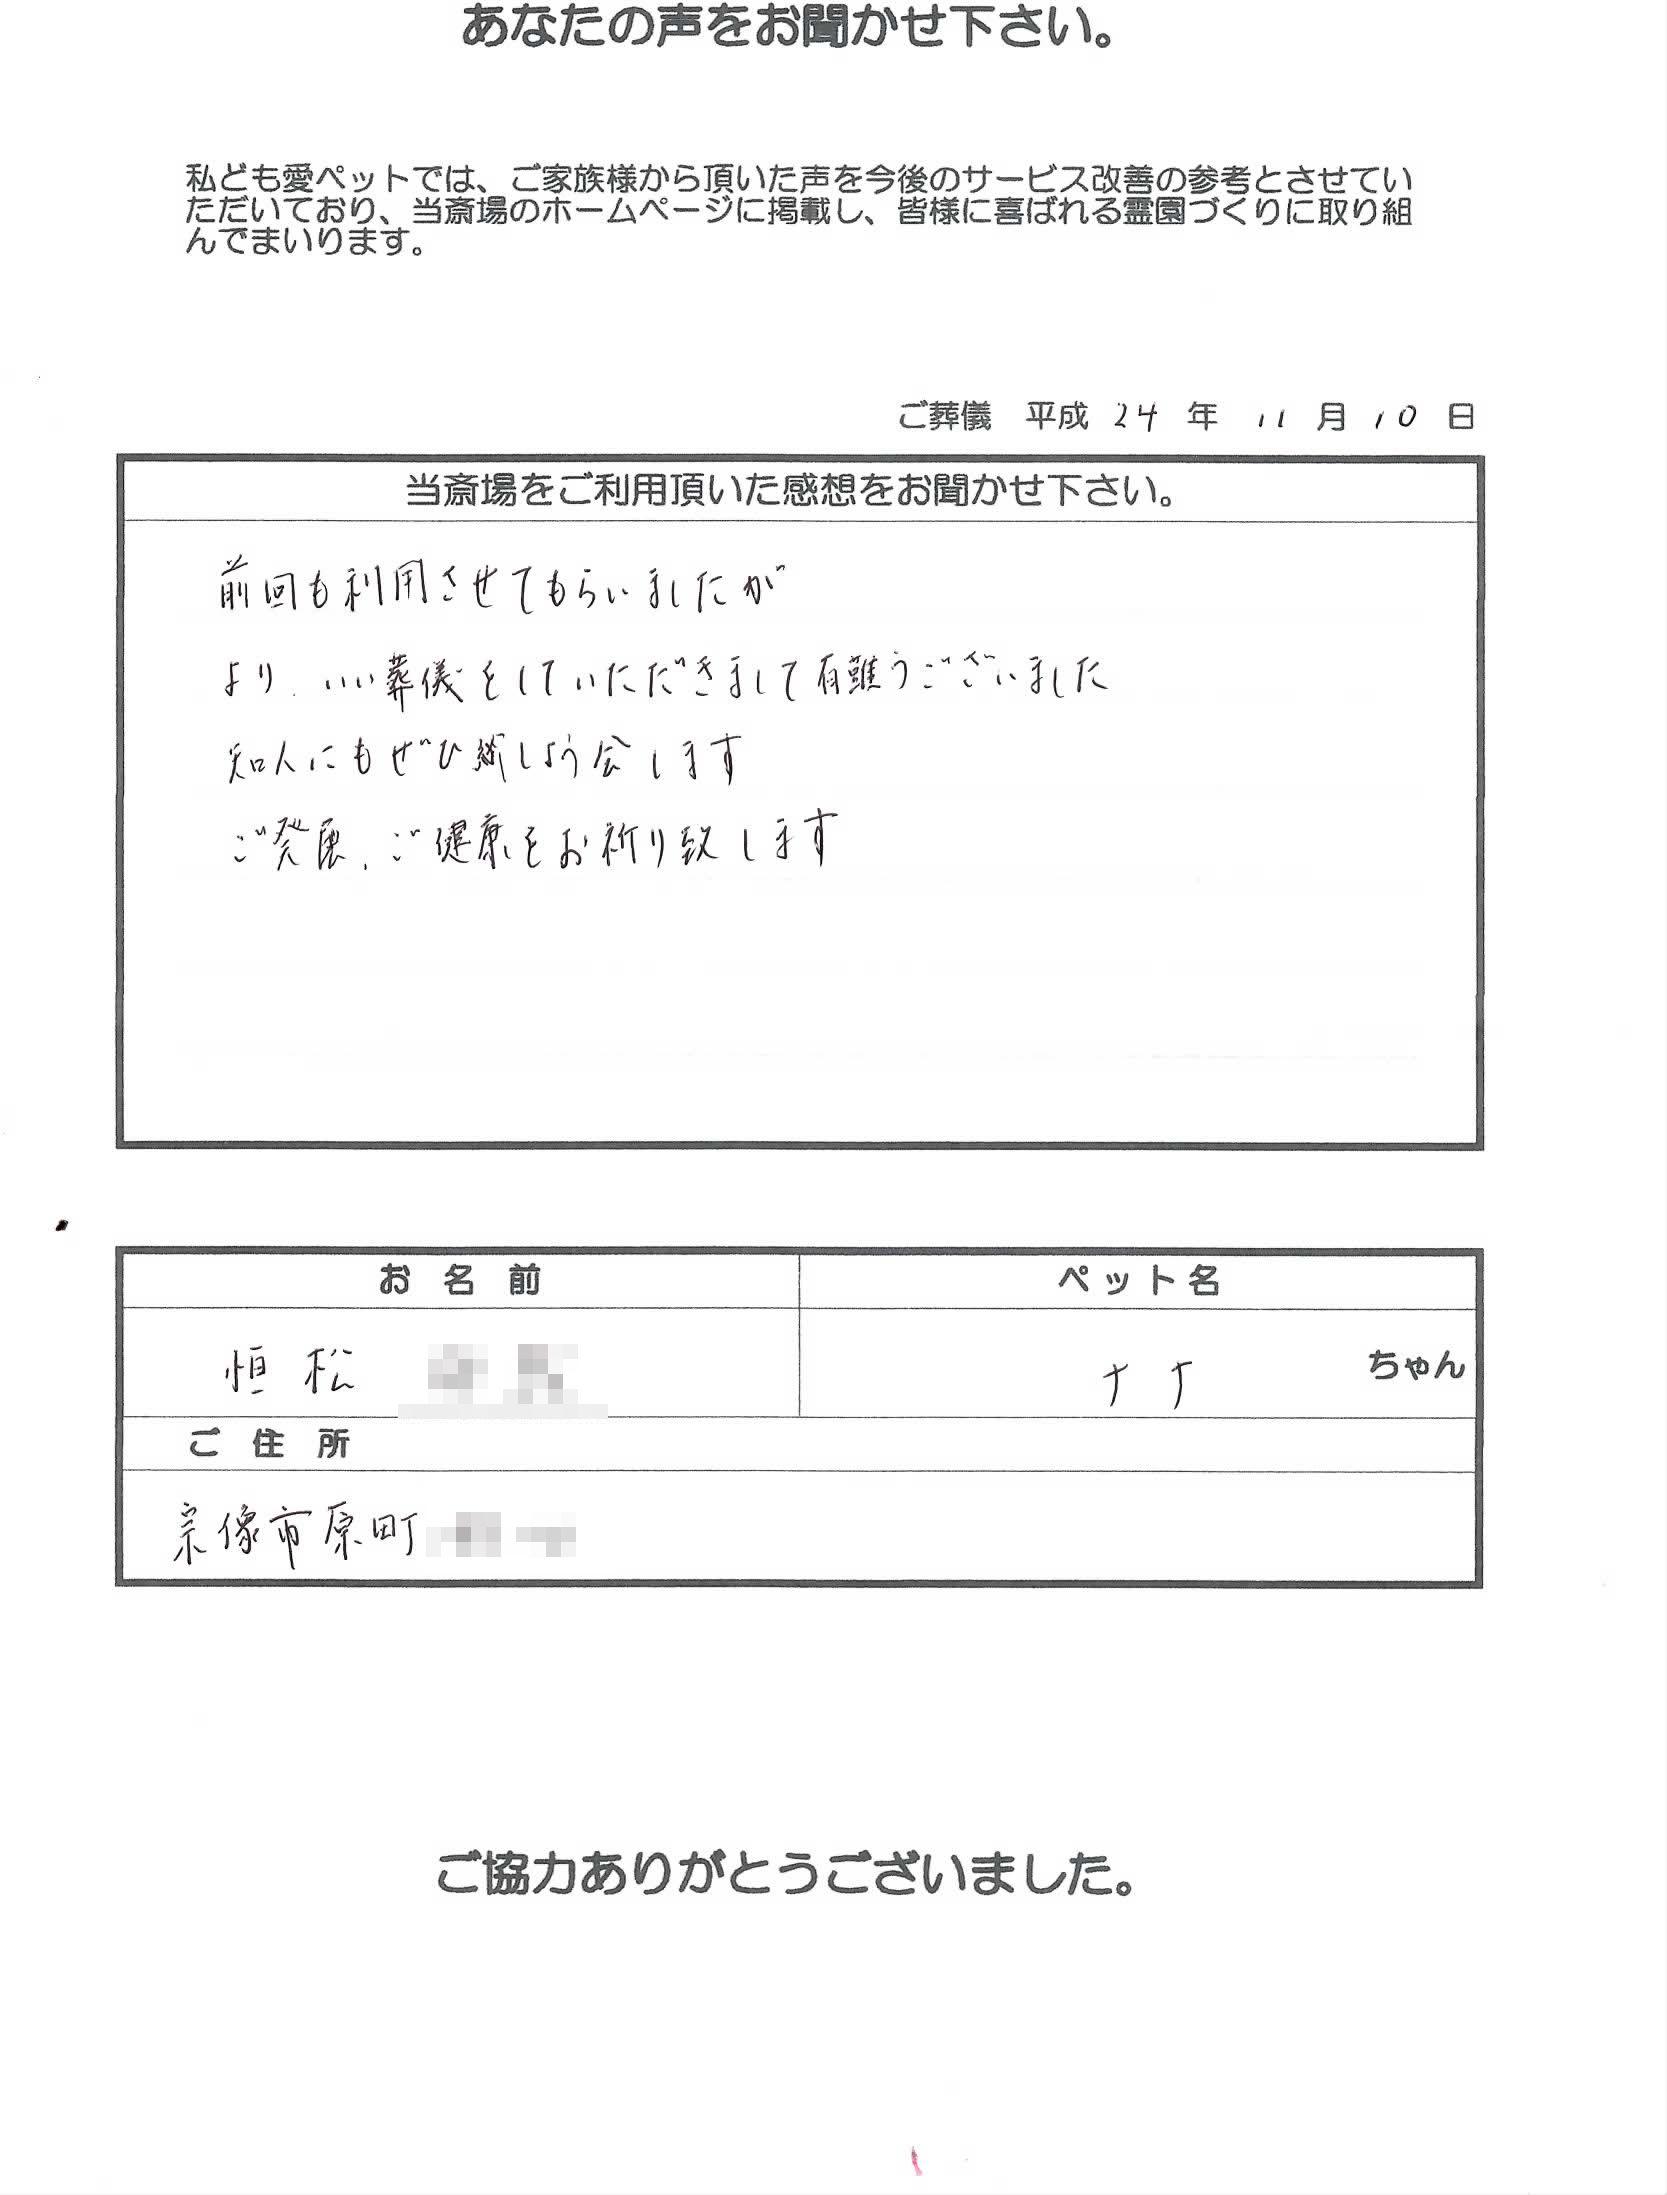 k121110-1.jpg